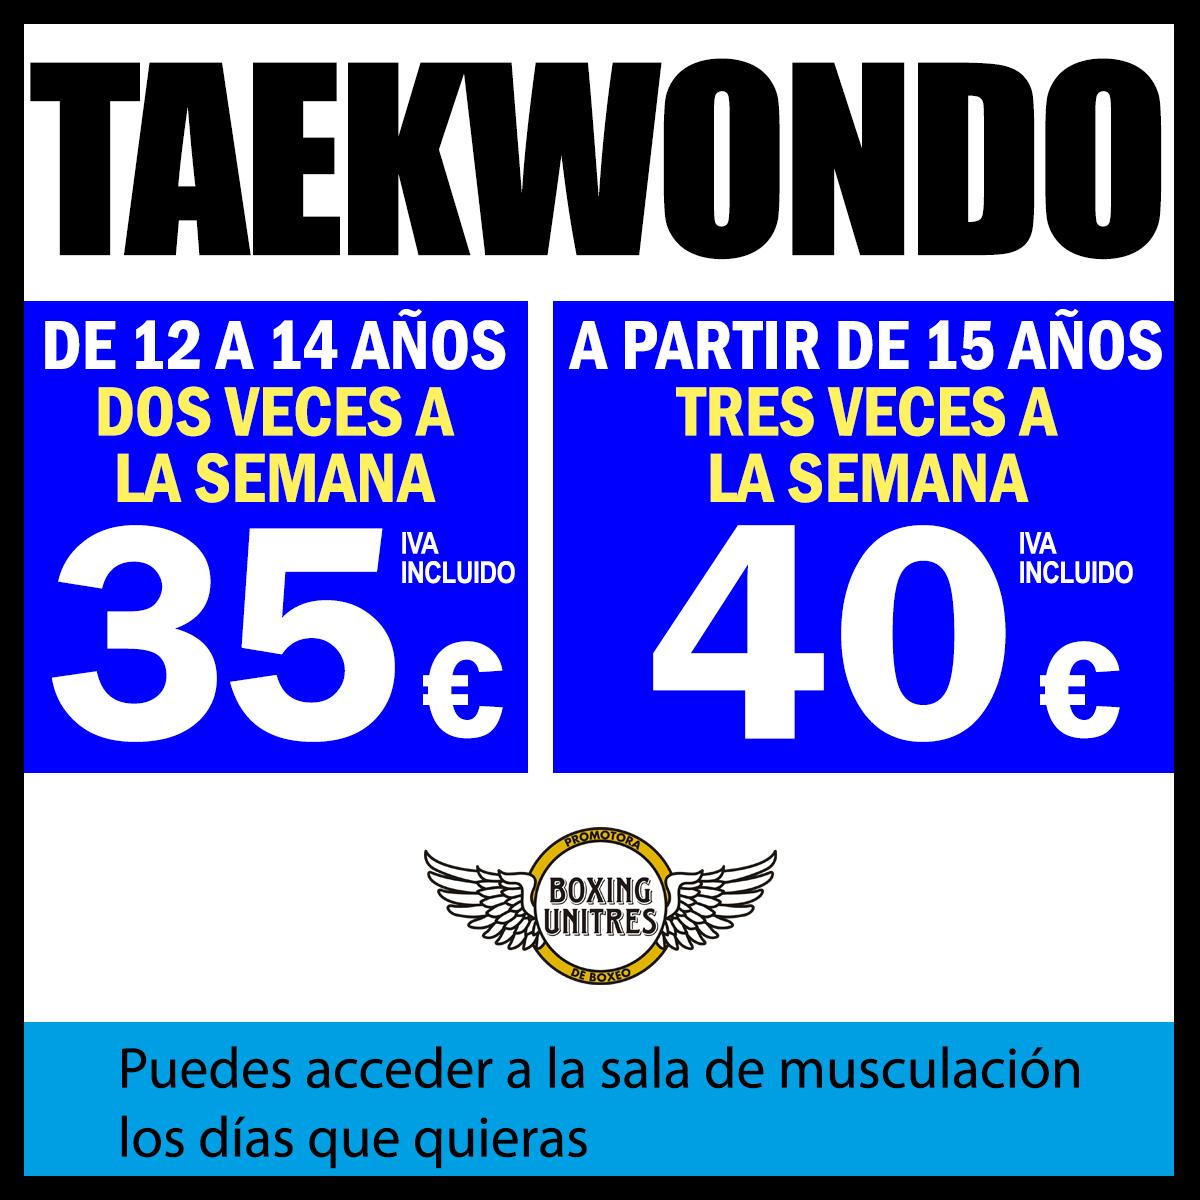 precios de clase del gimnasio taekwondo